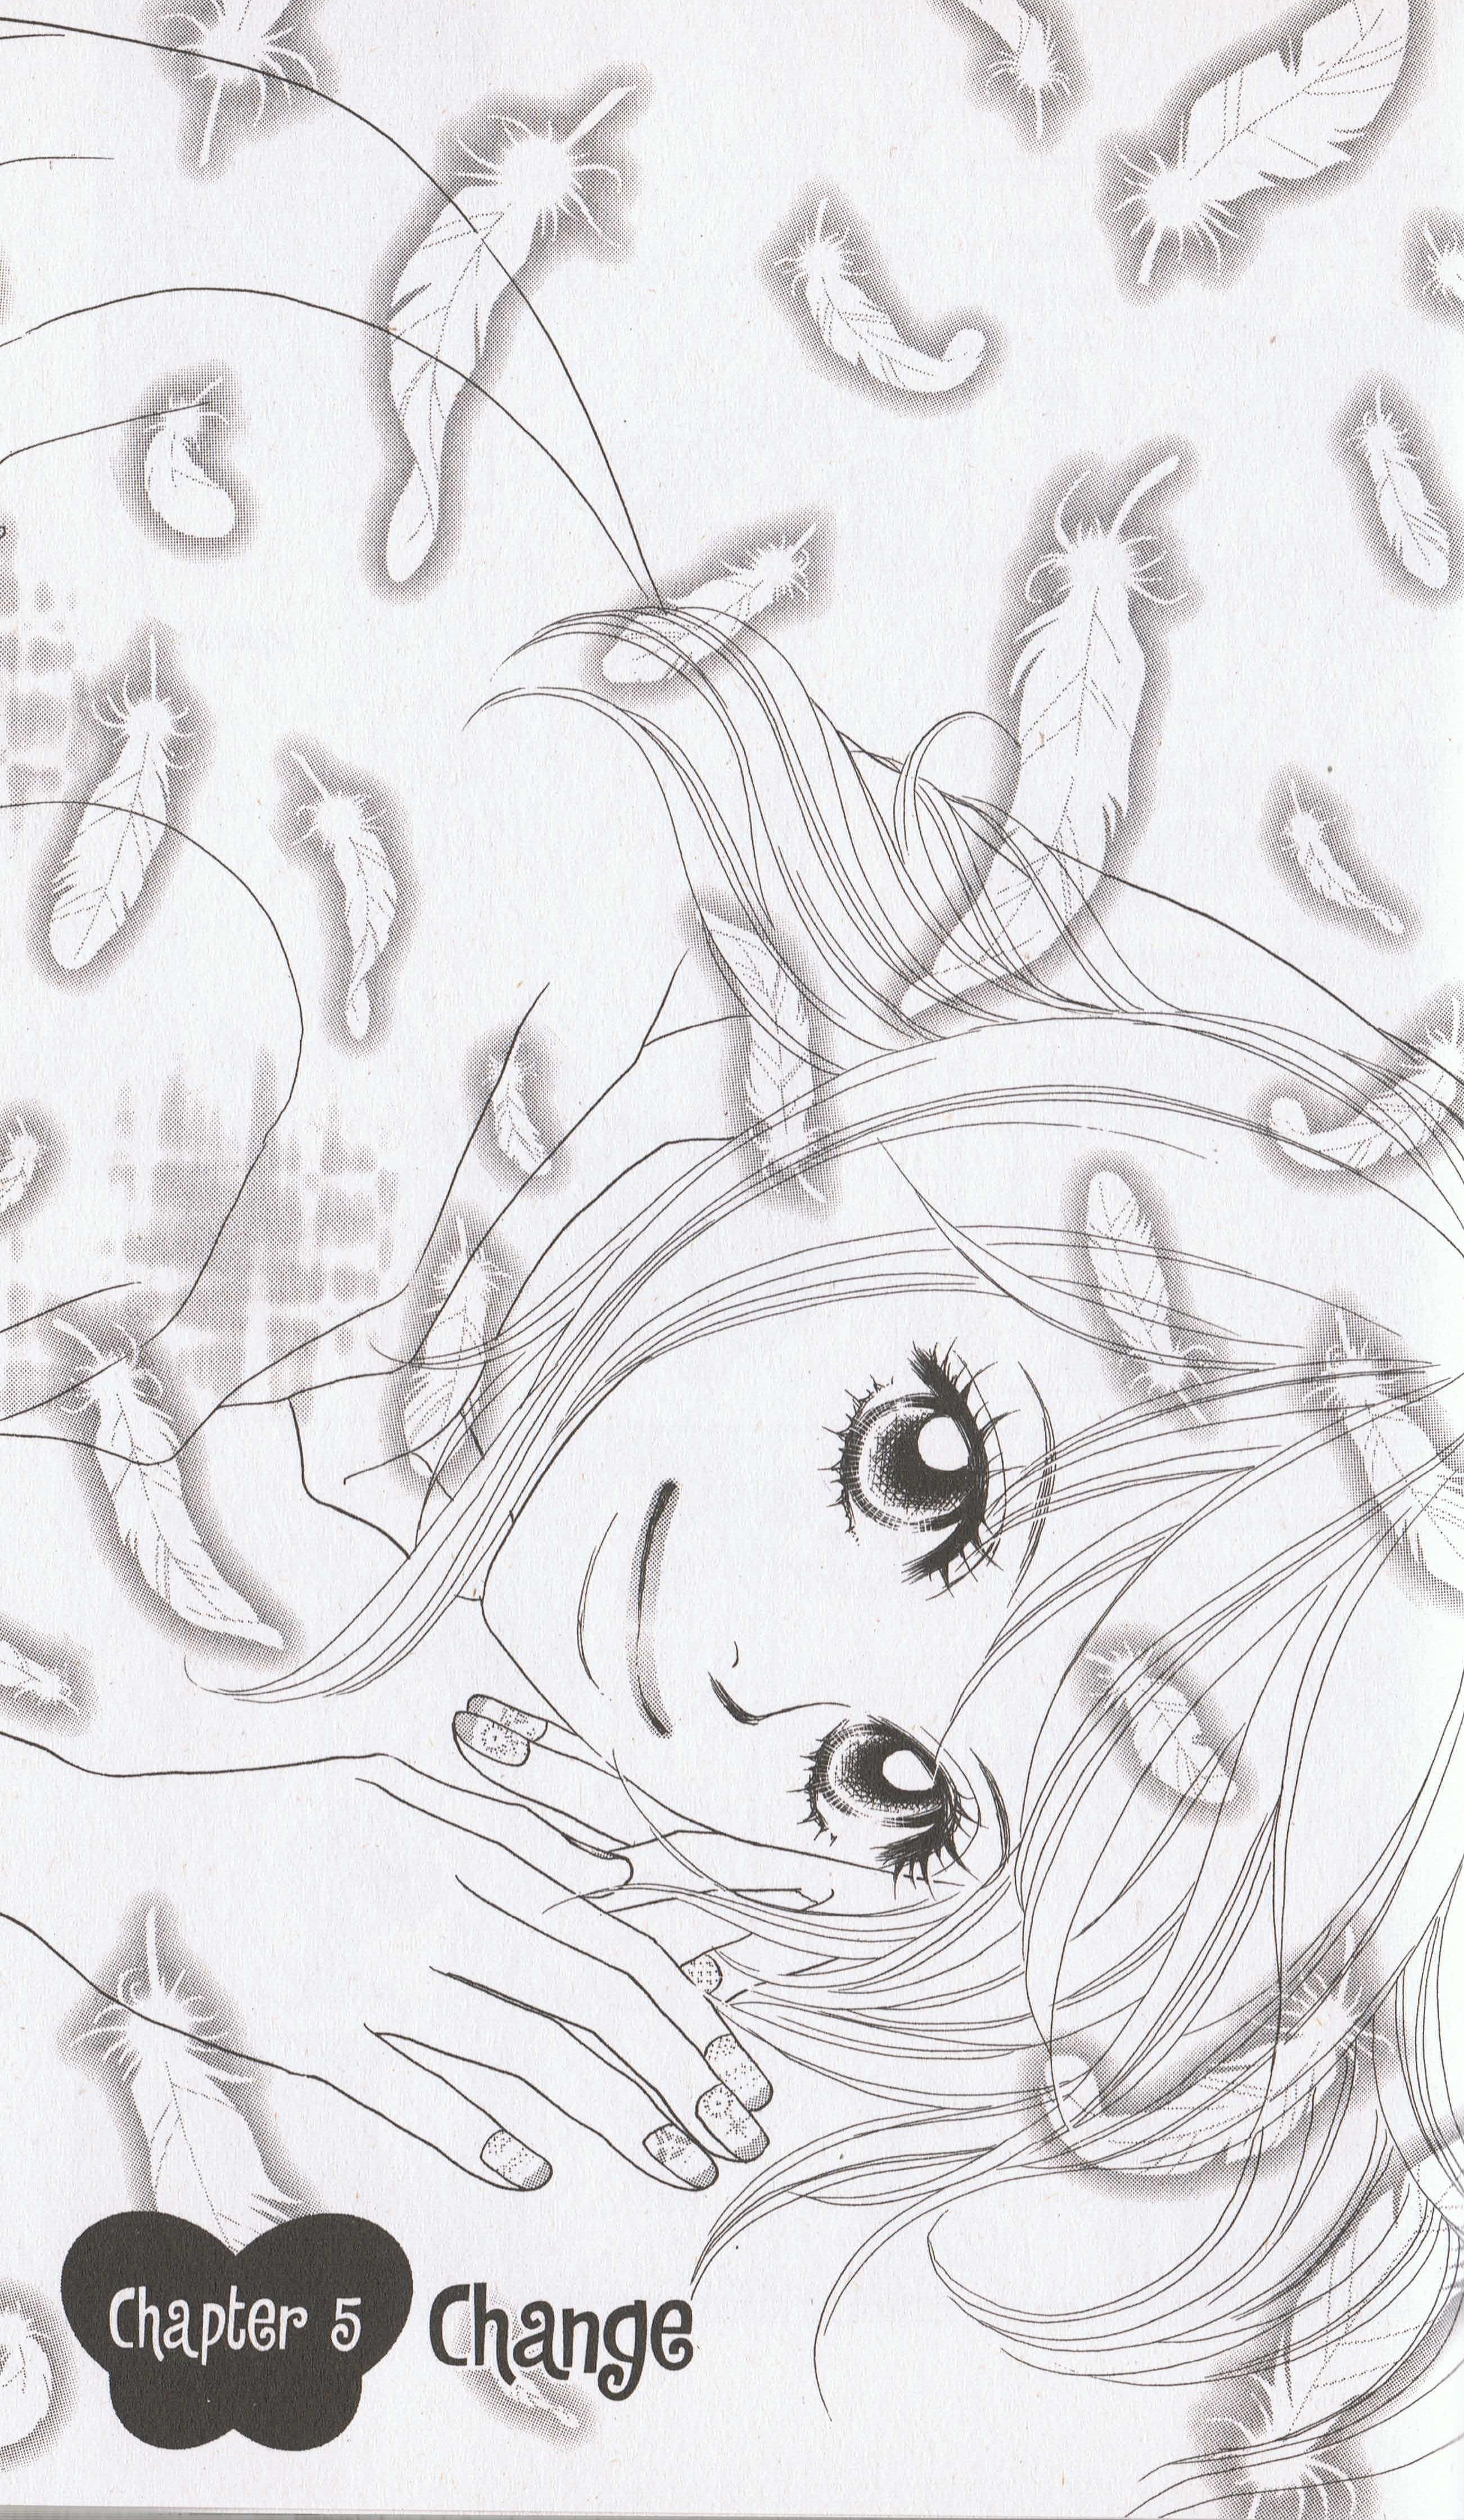 Hana-akari, an art print by Juri Ueda - INPRNT